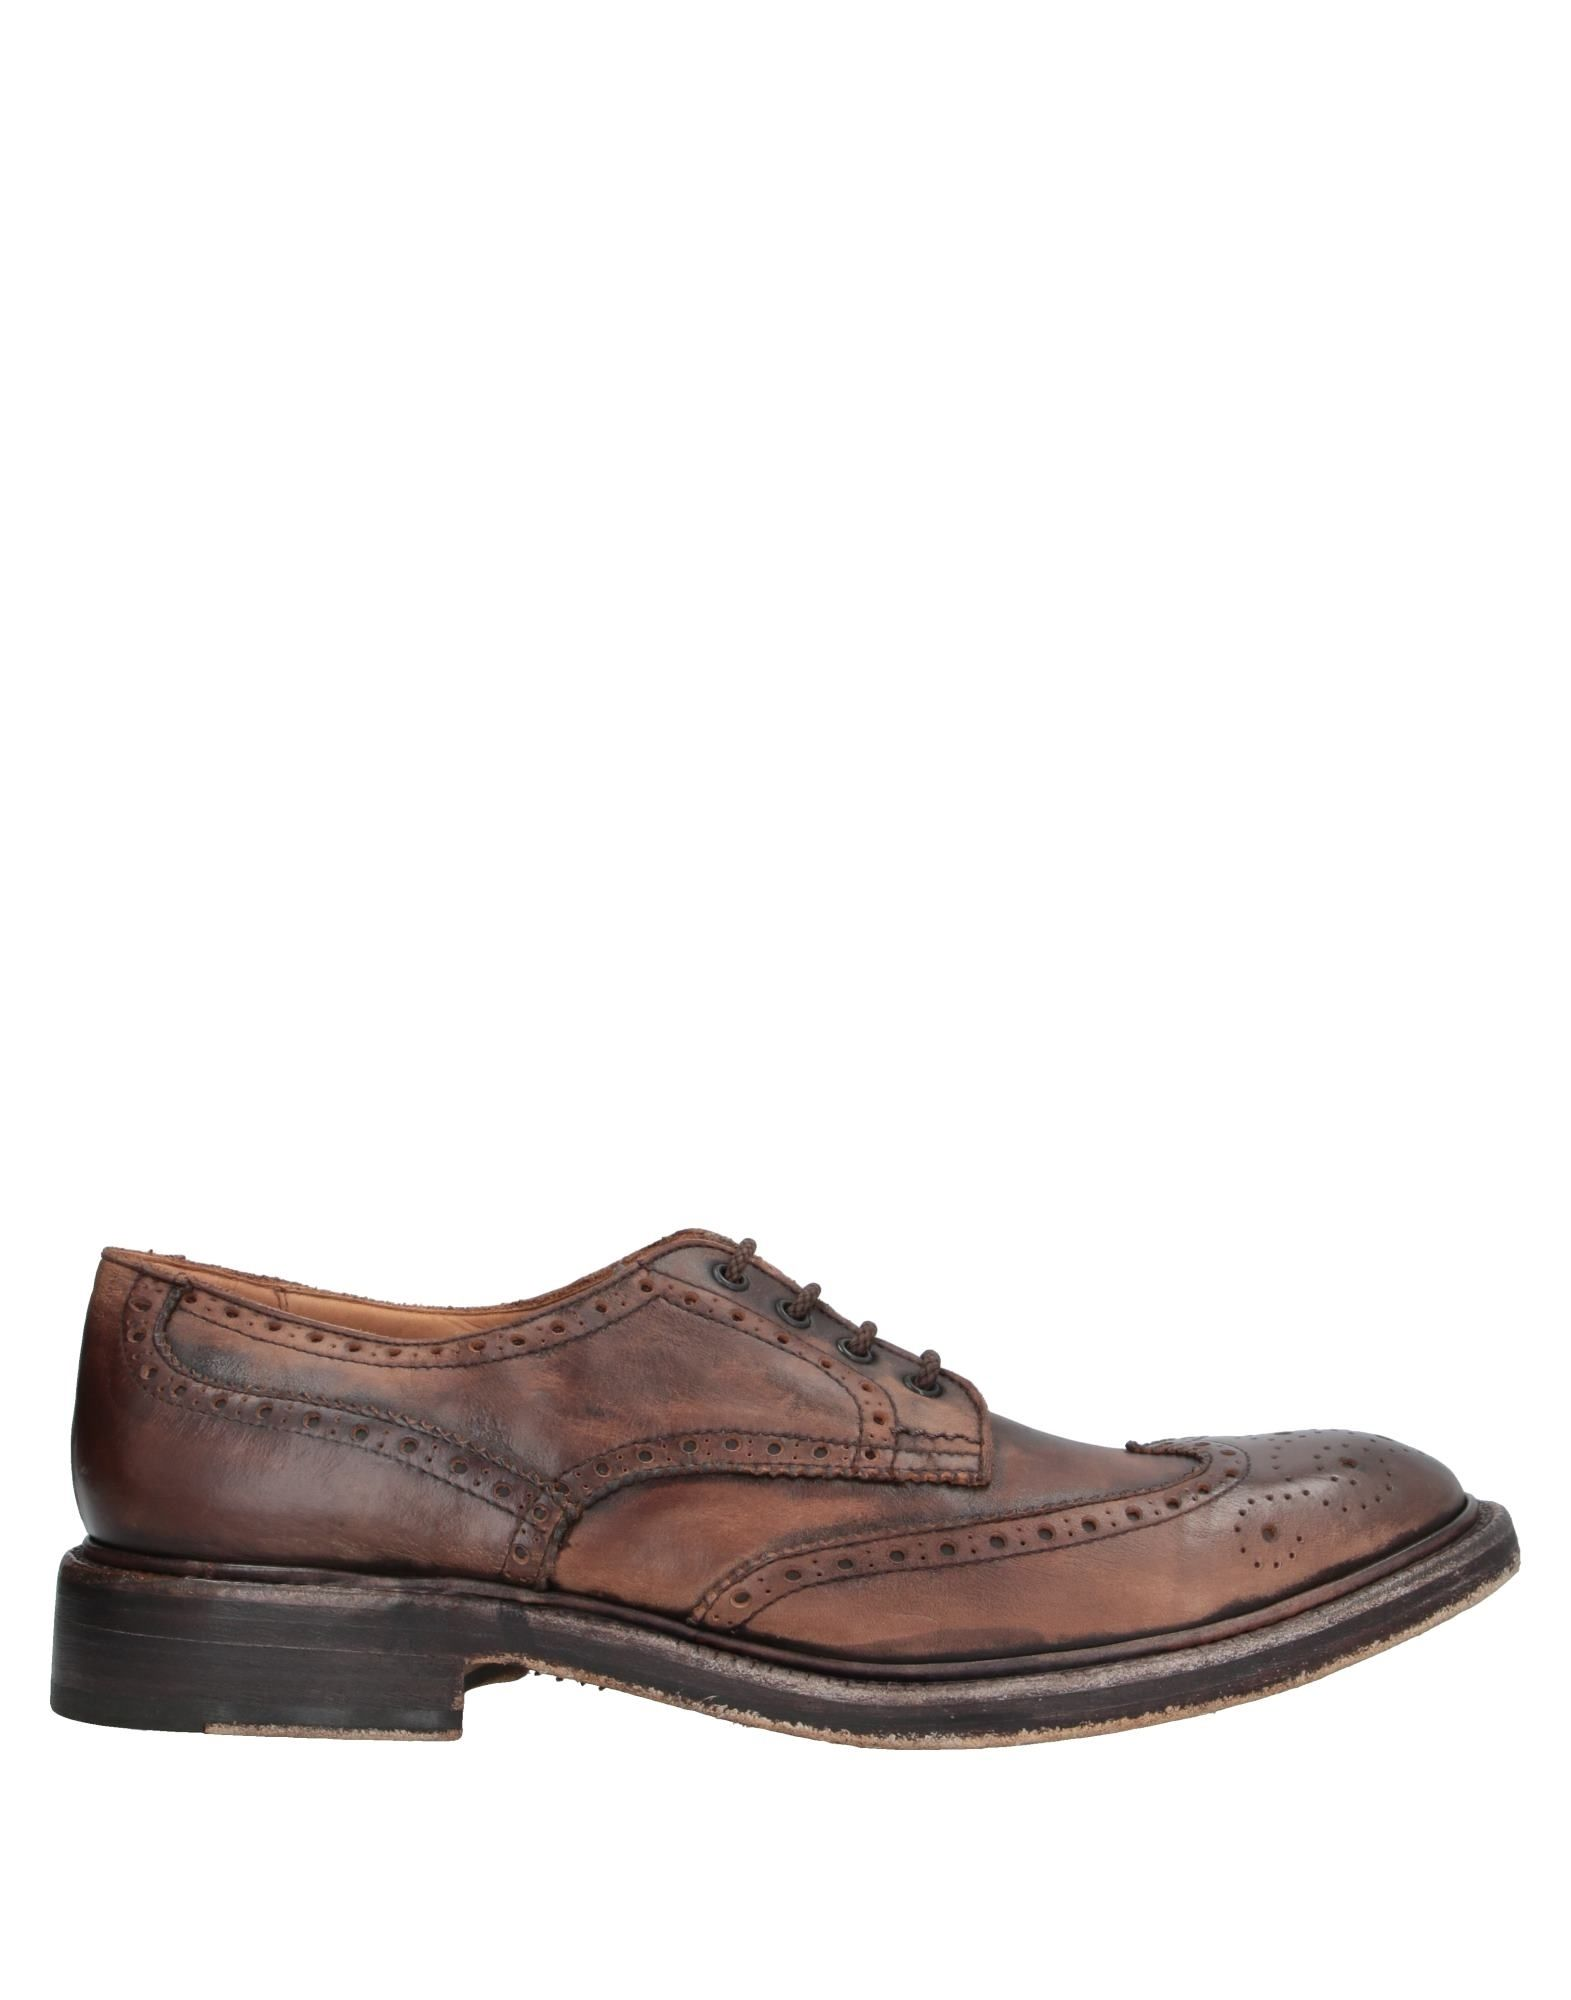 все цены на PAUL VAN HAAGEN Обувь на шнурках онлайн